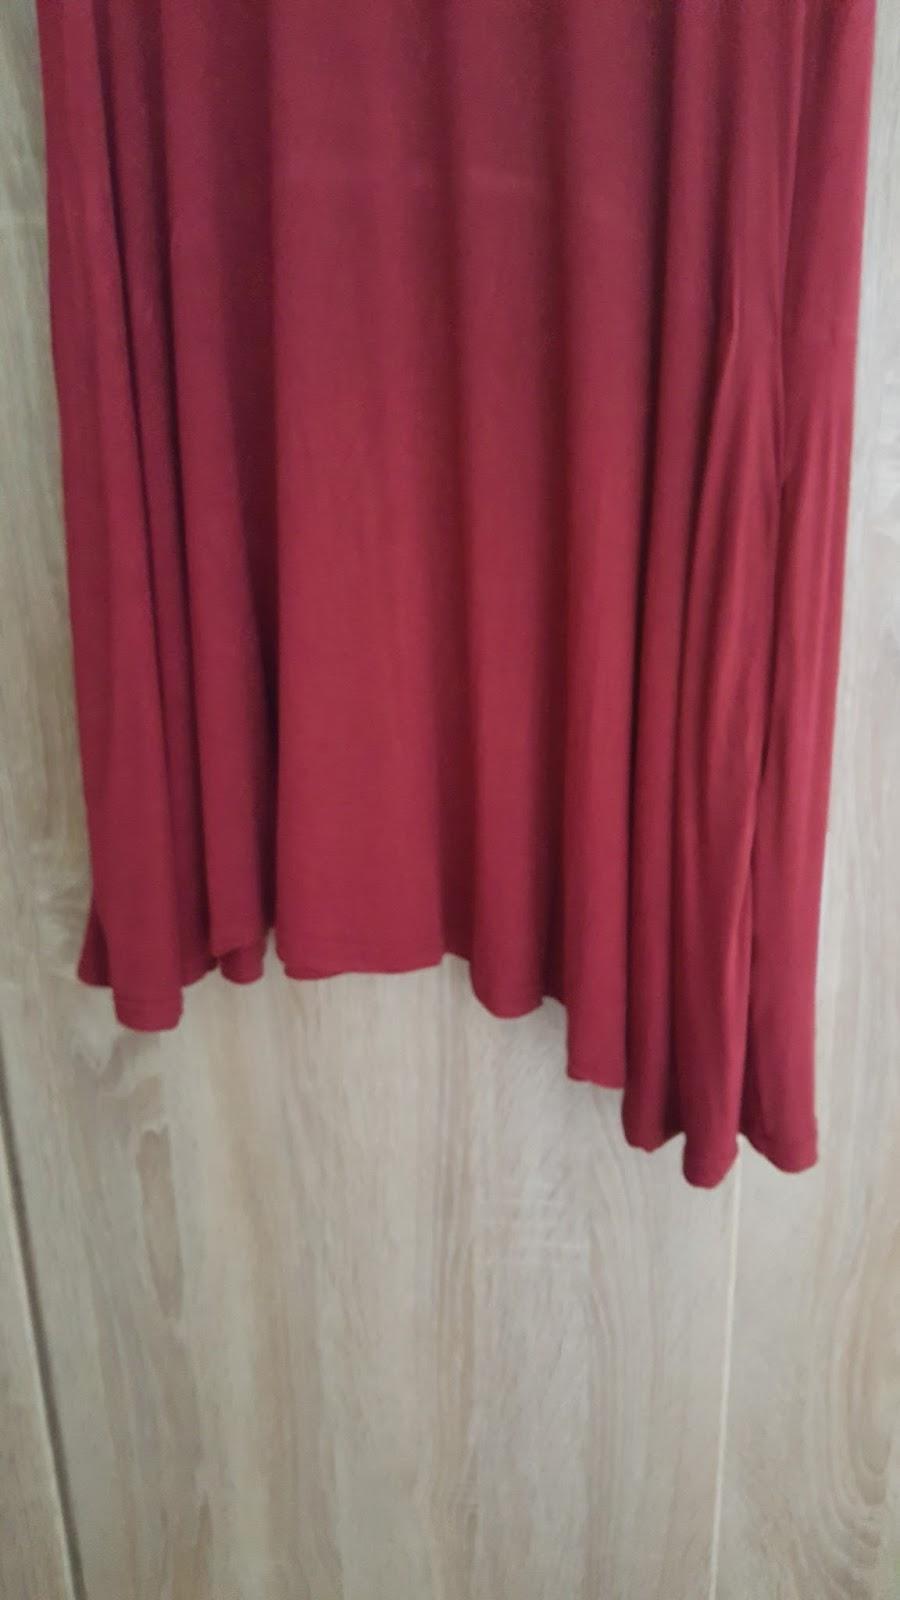 lahr2006 testet styledome damen lose v ausschnitt kurze rmel maxi hemdkleid minikleid. Black Bedroom Furniture Sets. Home Design Ideas